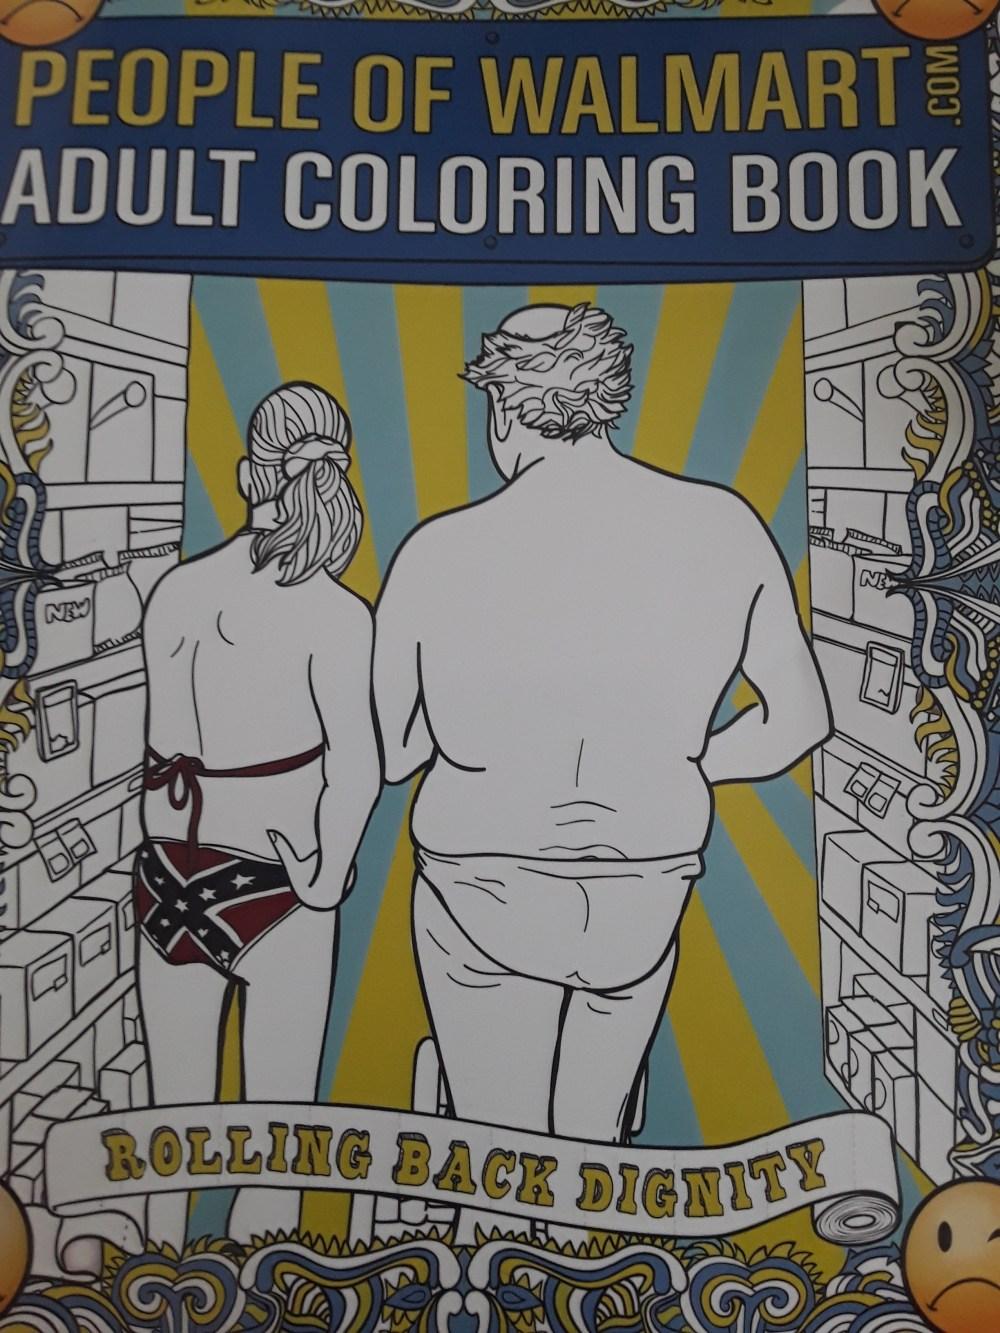 people of walmart adult coloring book — pumkinfish